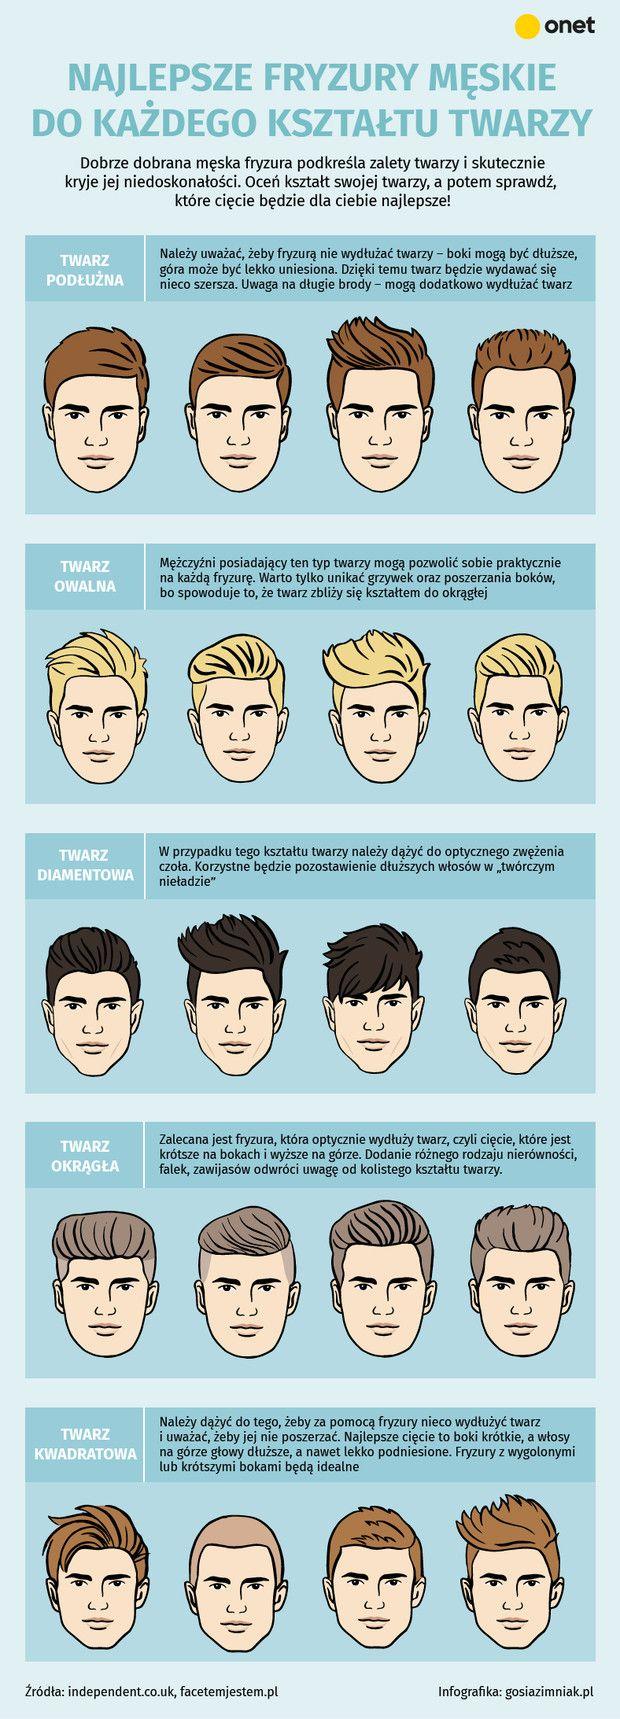 #infografika #fryzury #infographic